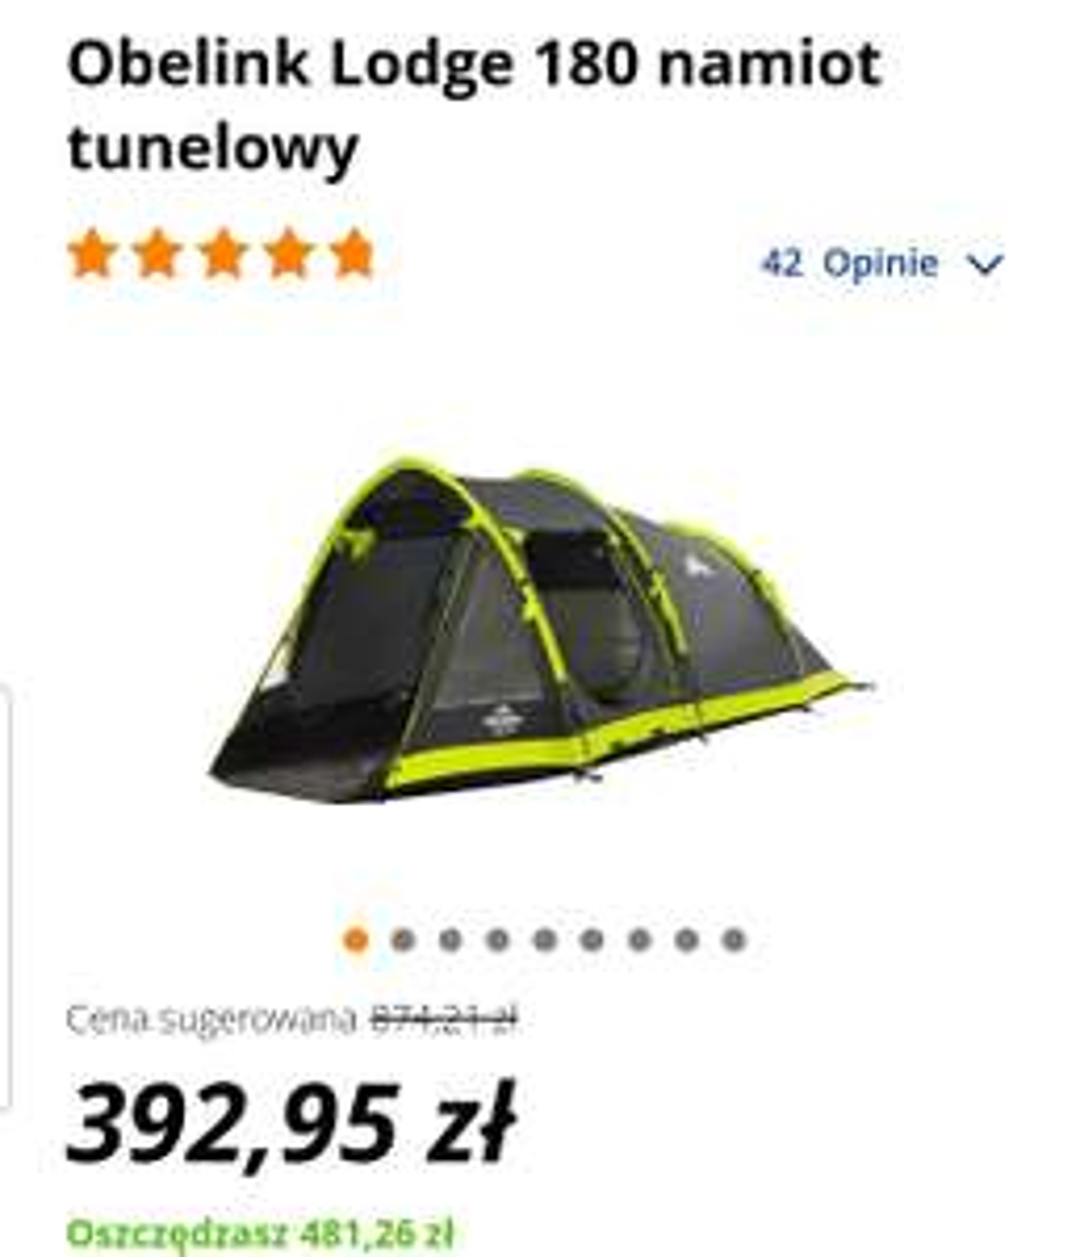 Namiot 3-os # Obelink Lodge 180 namiot tunelowy